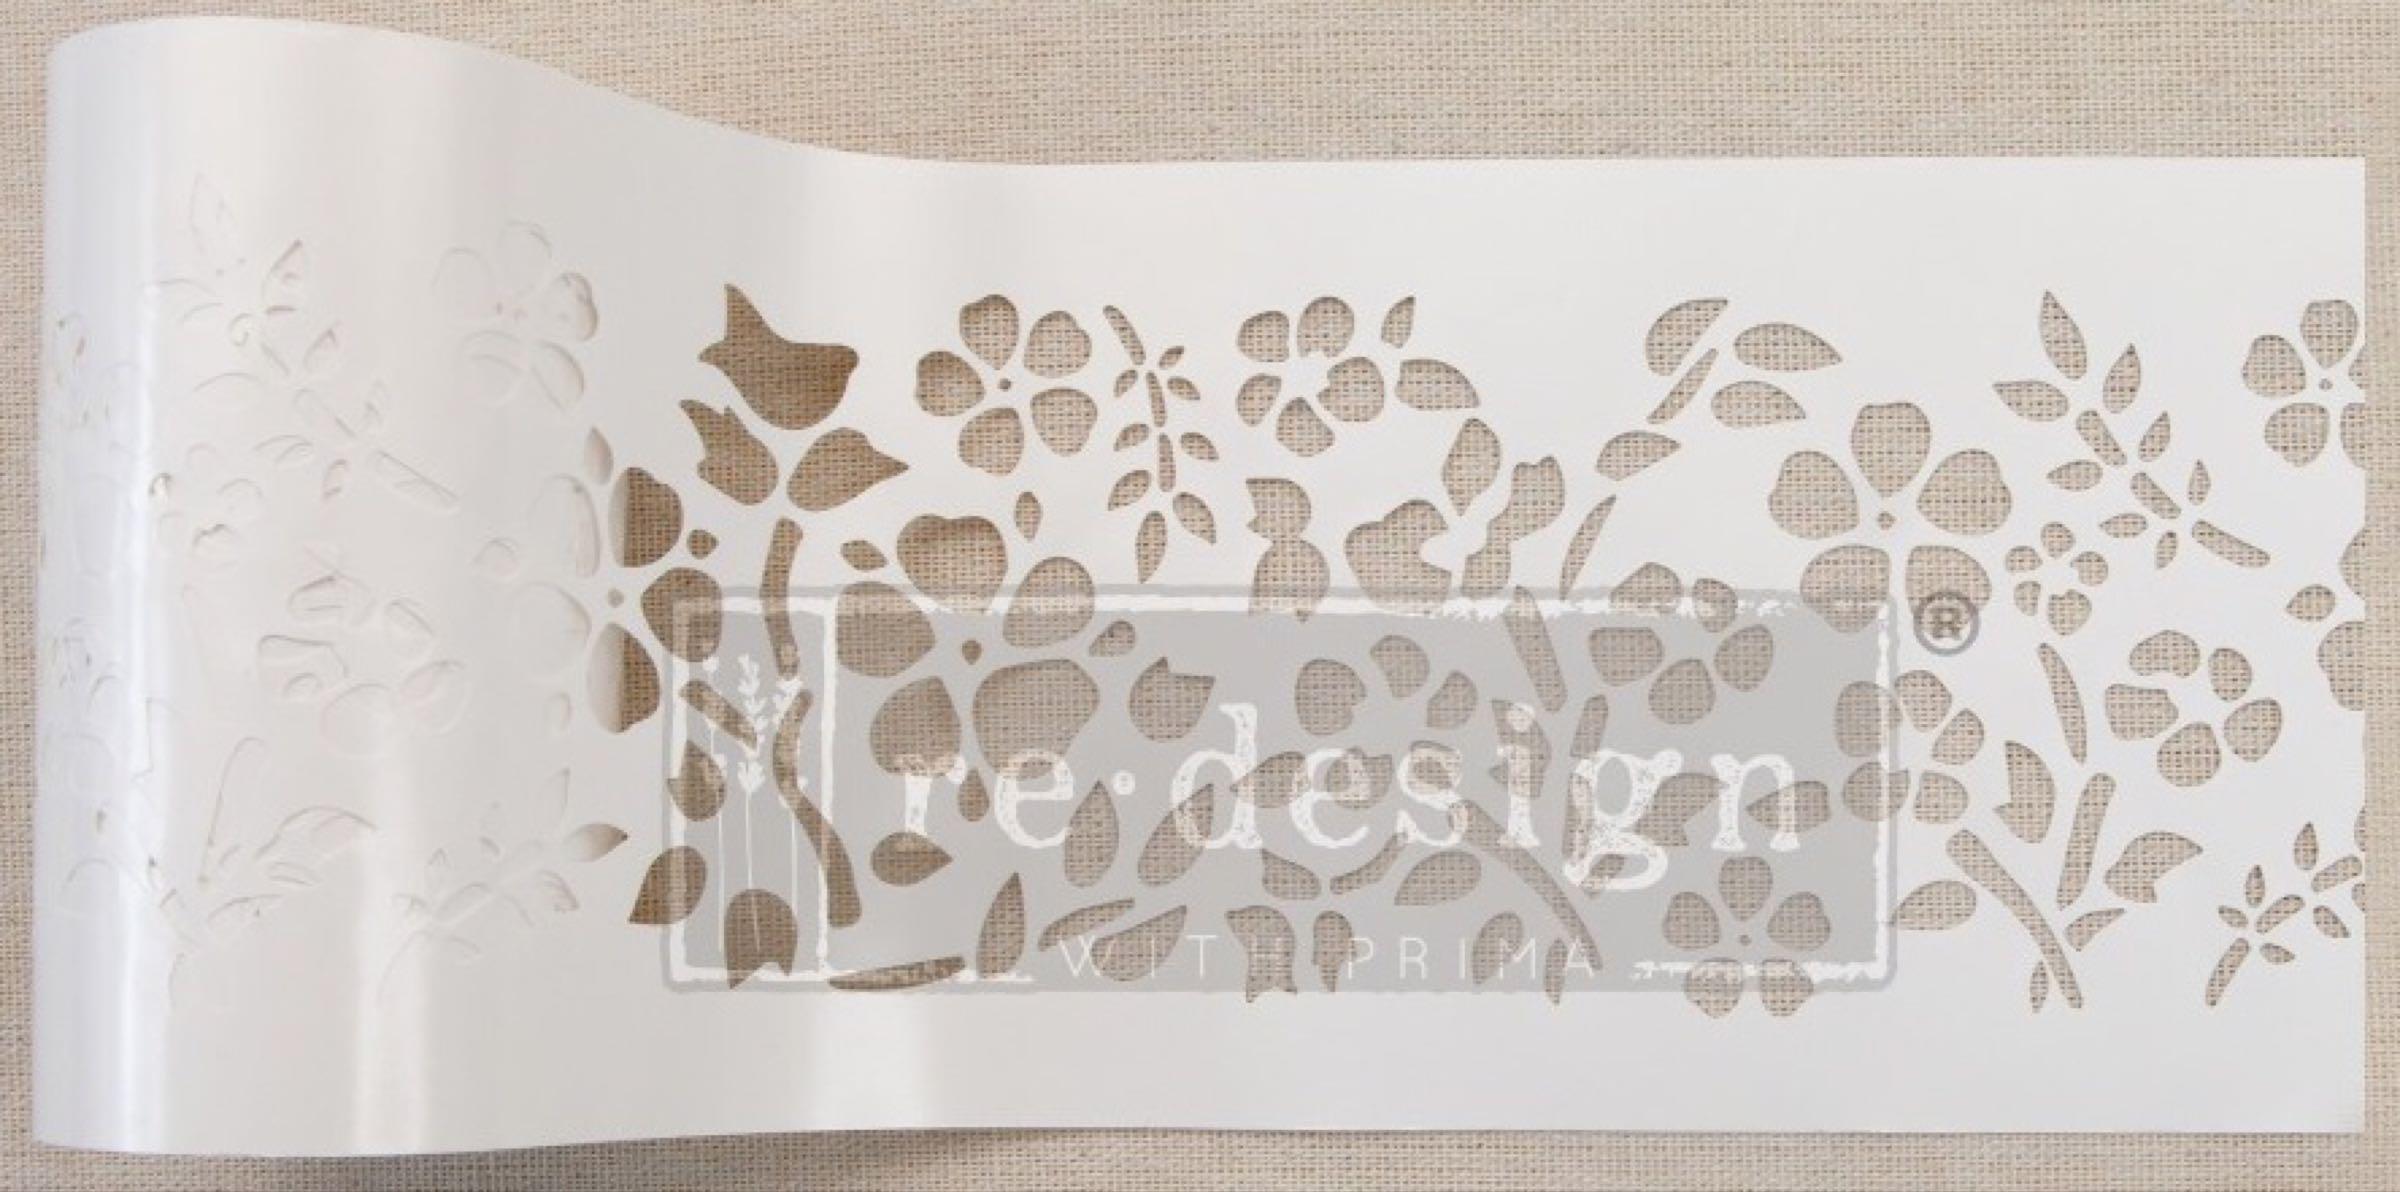 Re-design with Prima Stencil Roll - Royal Ann Garden (Special Order)